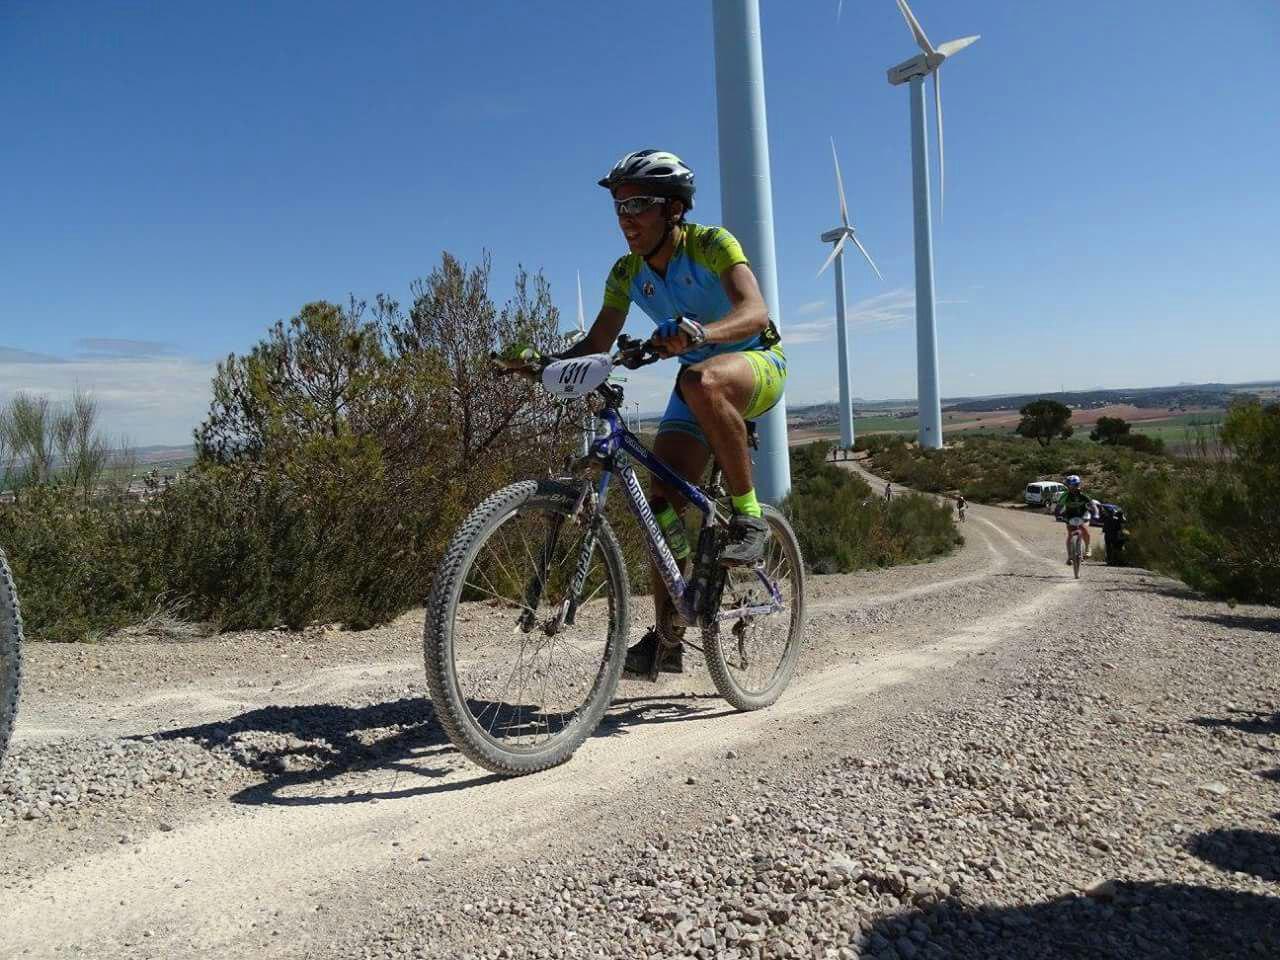 Crónica marcha BTT Pozo Cañada del X circuito de Albacete por Paquito206